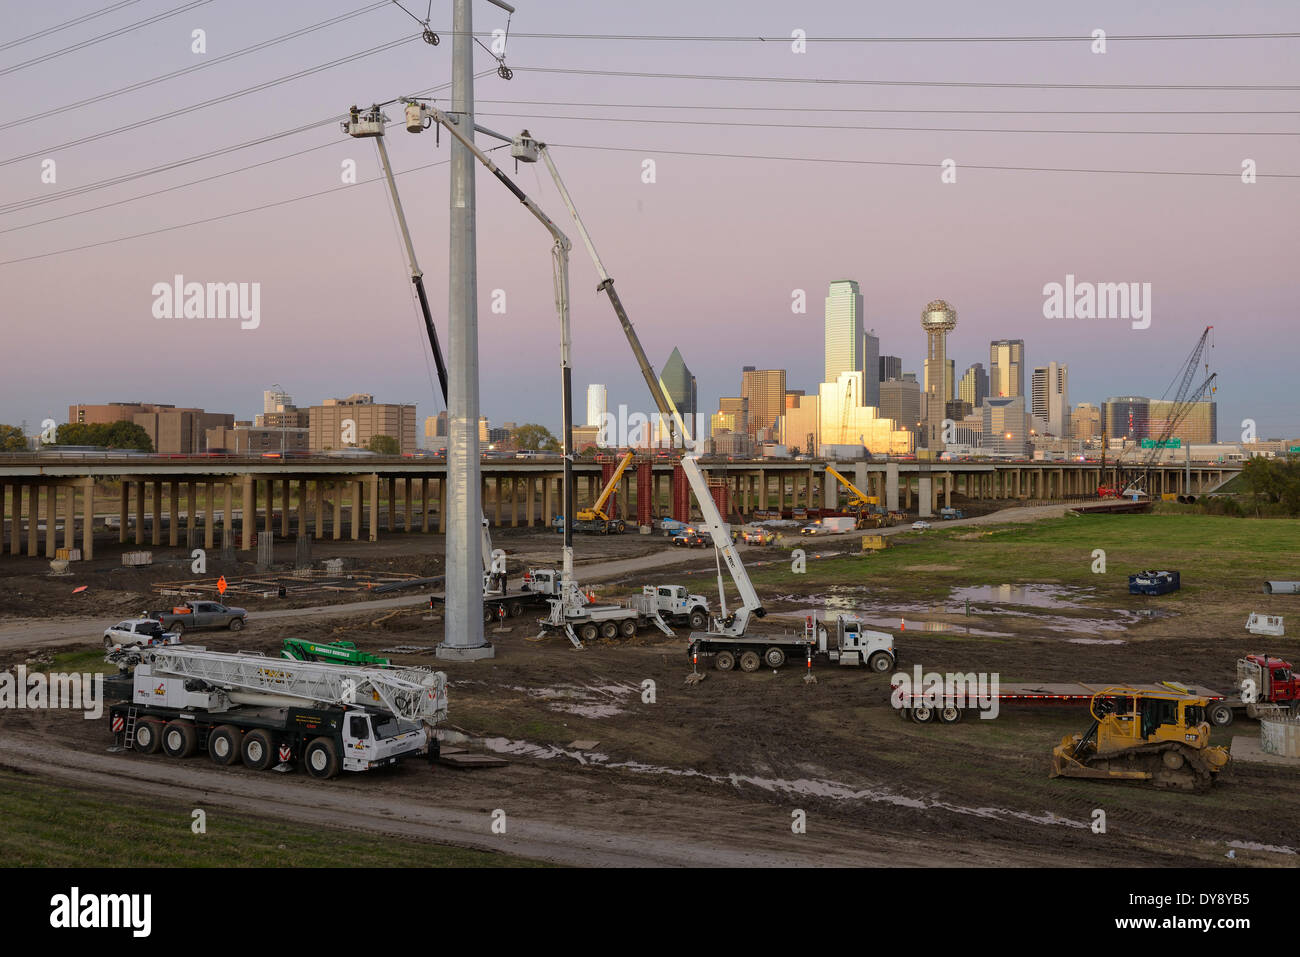 North America, Texas, USA, United States, America, Dallas, power, power lines, construction, work, urban - Stock Image